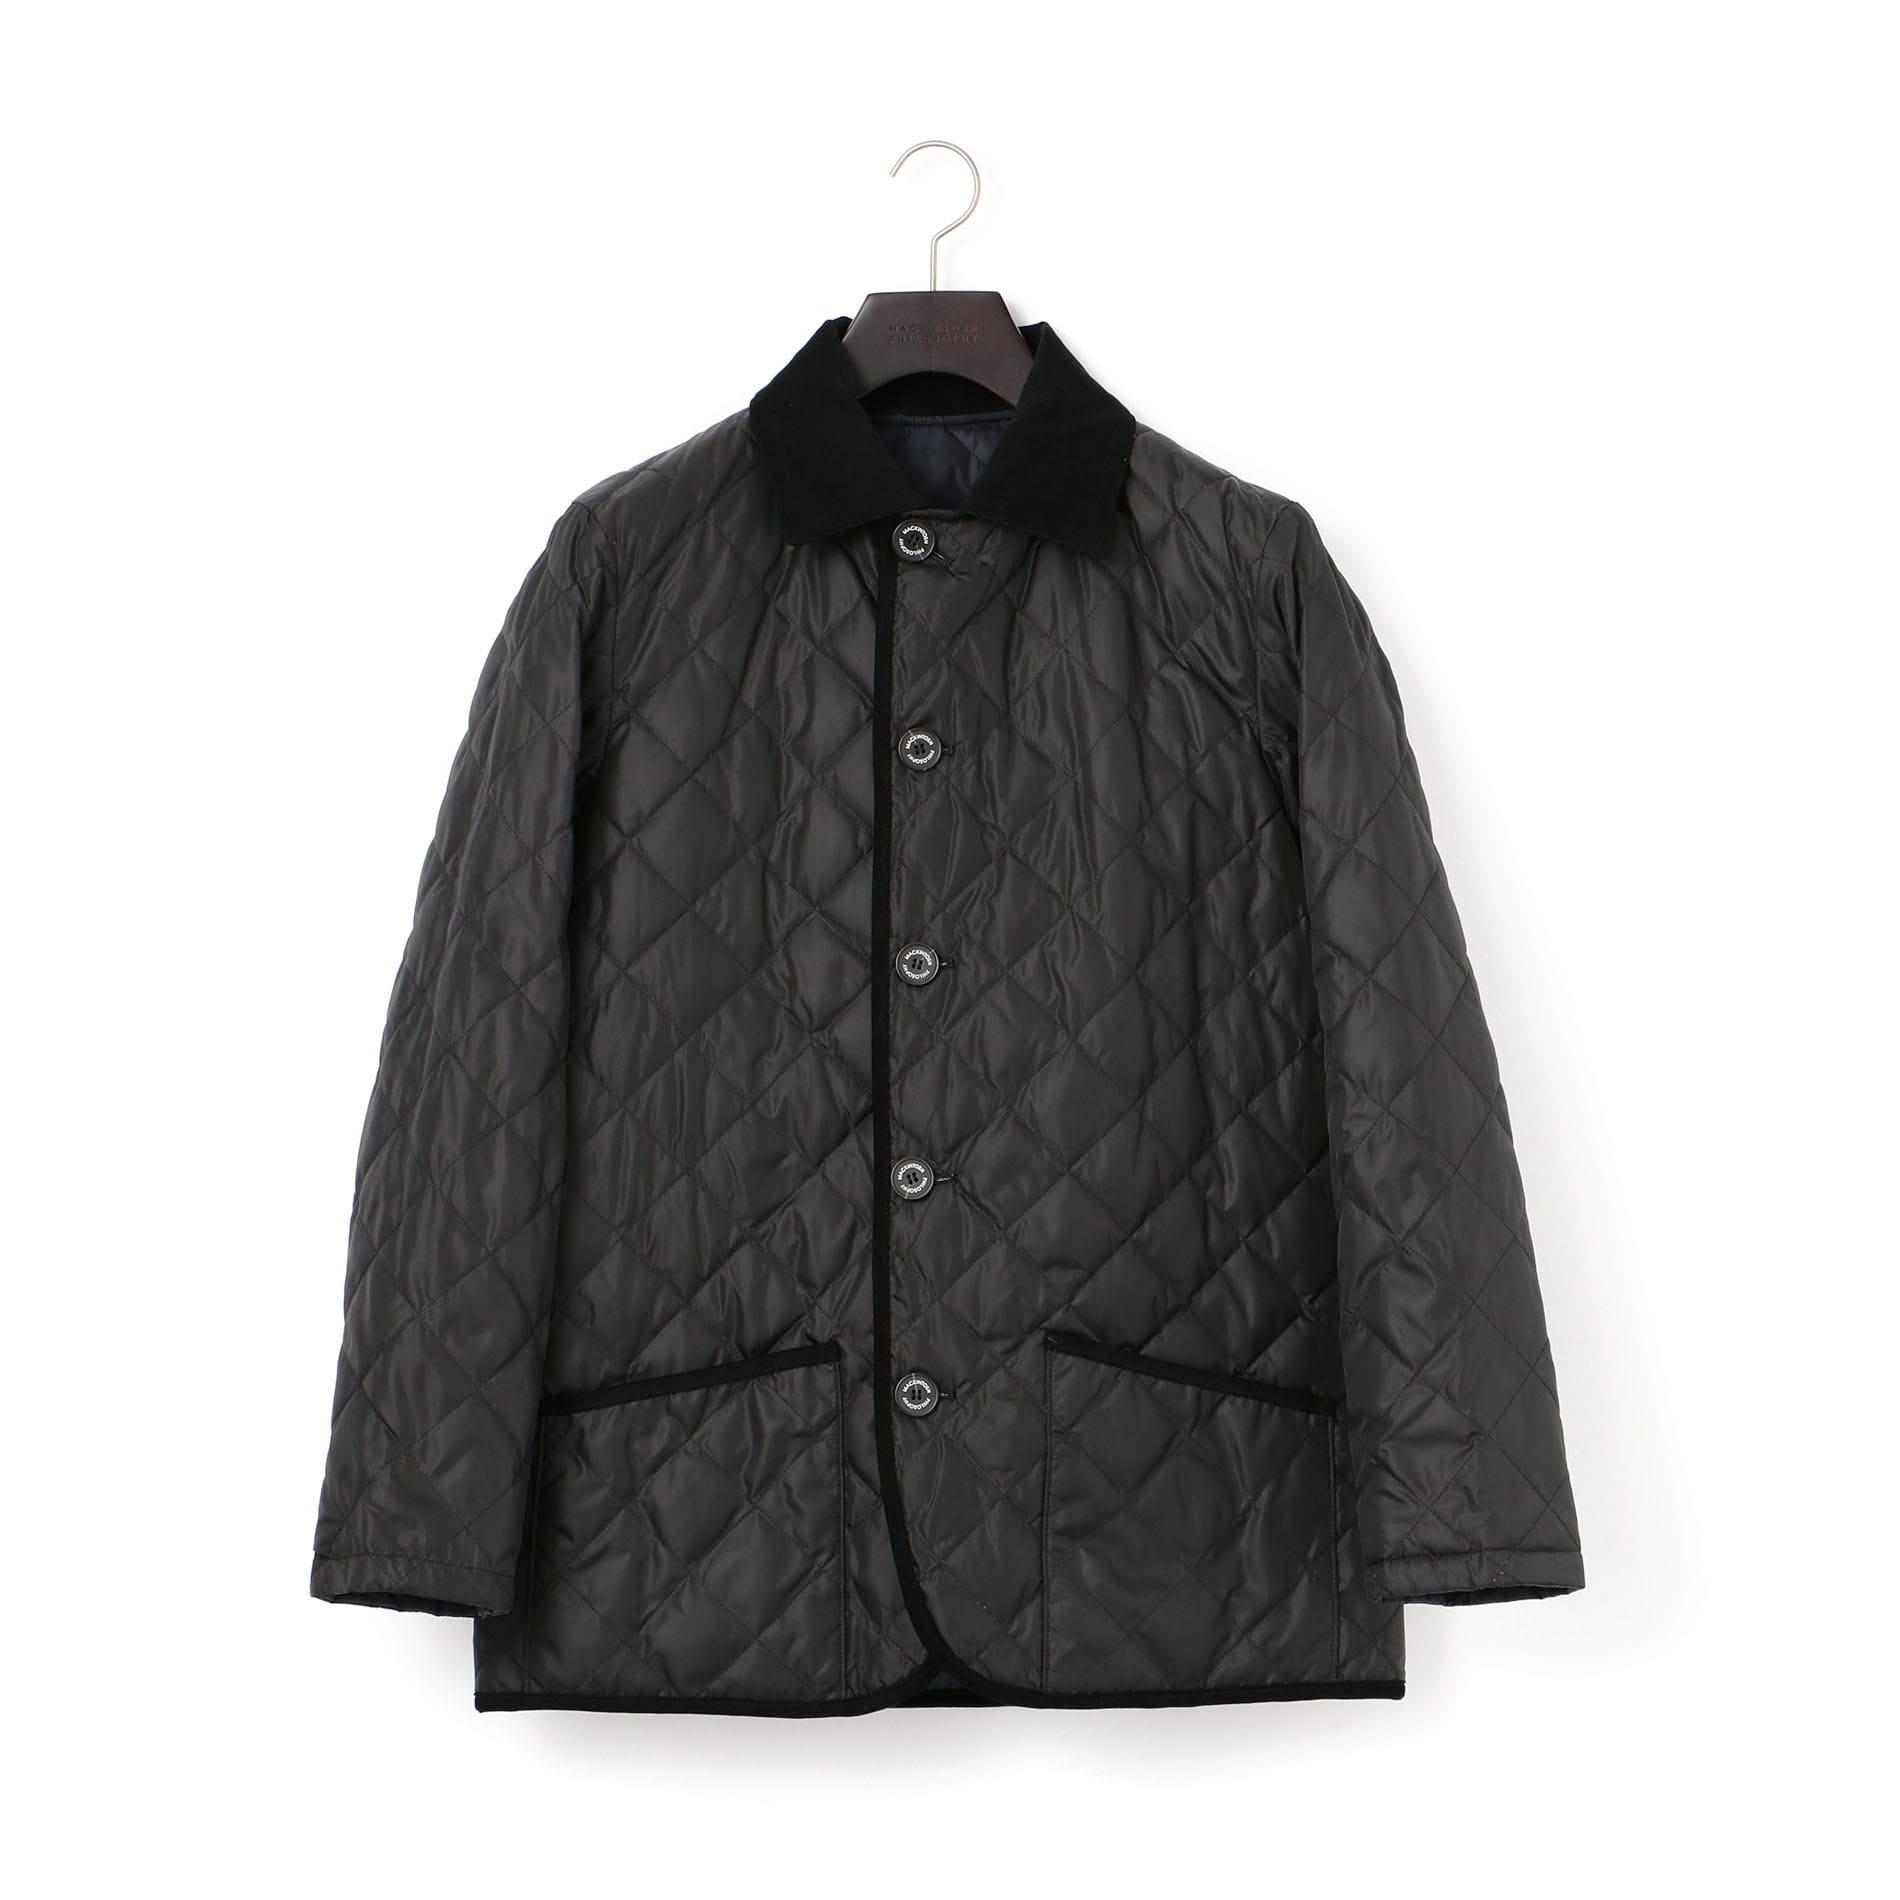 【WARENFORD】 高密度ポリエステルタフタ キルティングジャケット